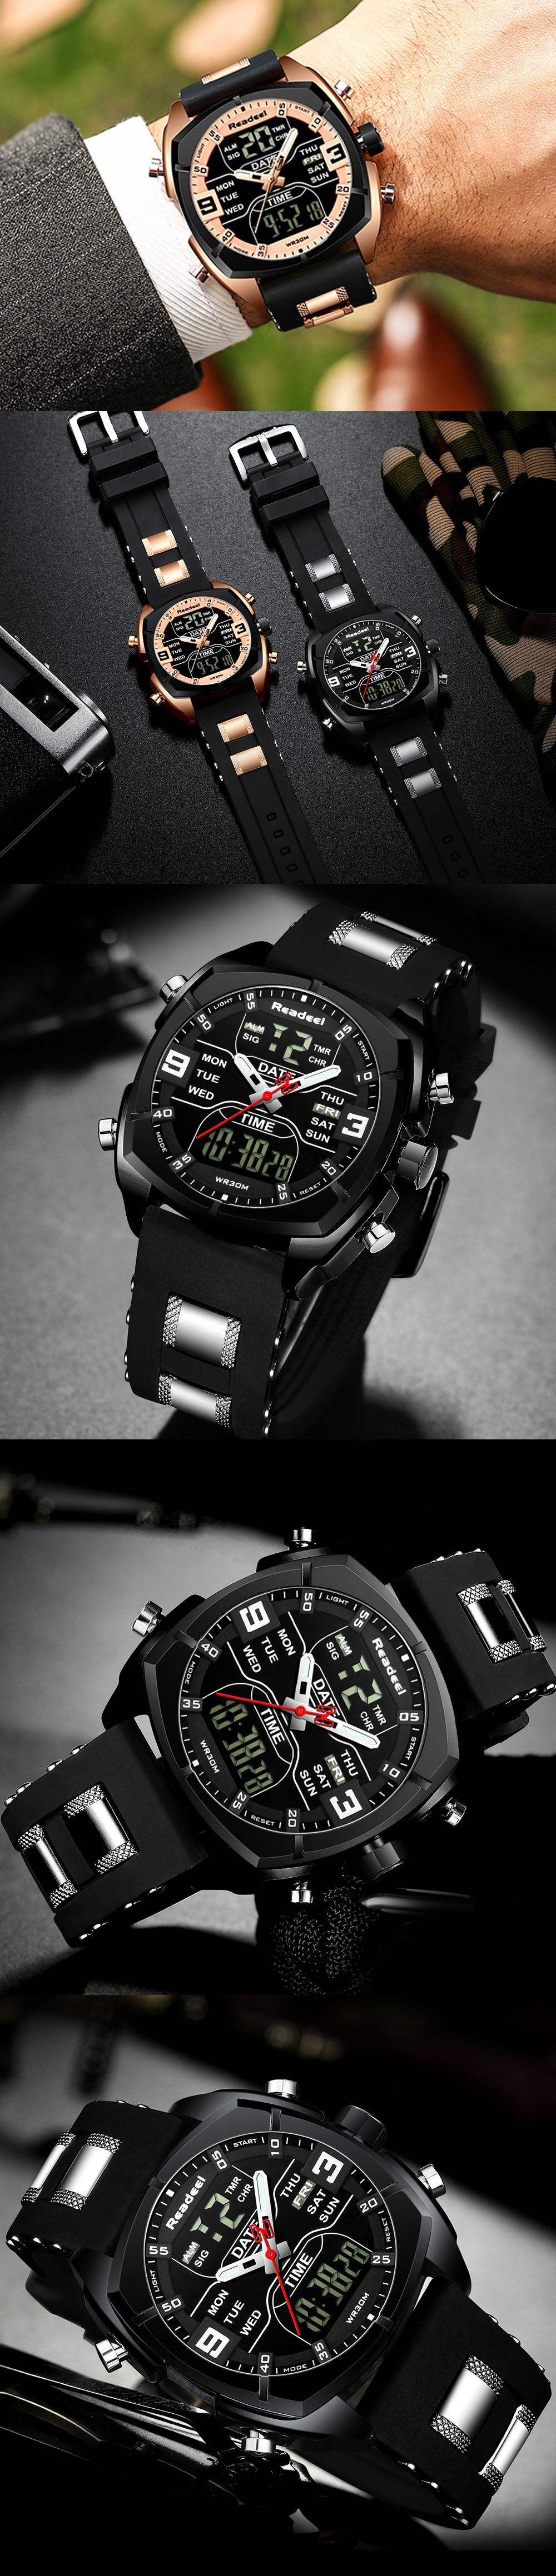 H23f2add6c4f94a8ba8859b24f763fe3aO Mens Watches Luxury Brand Men Sports Watches Men's Quartz LED Digital Clock Male Rubber Military Wrist Watch Relogios Masculinos